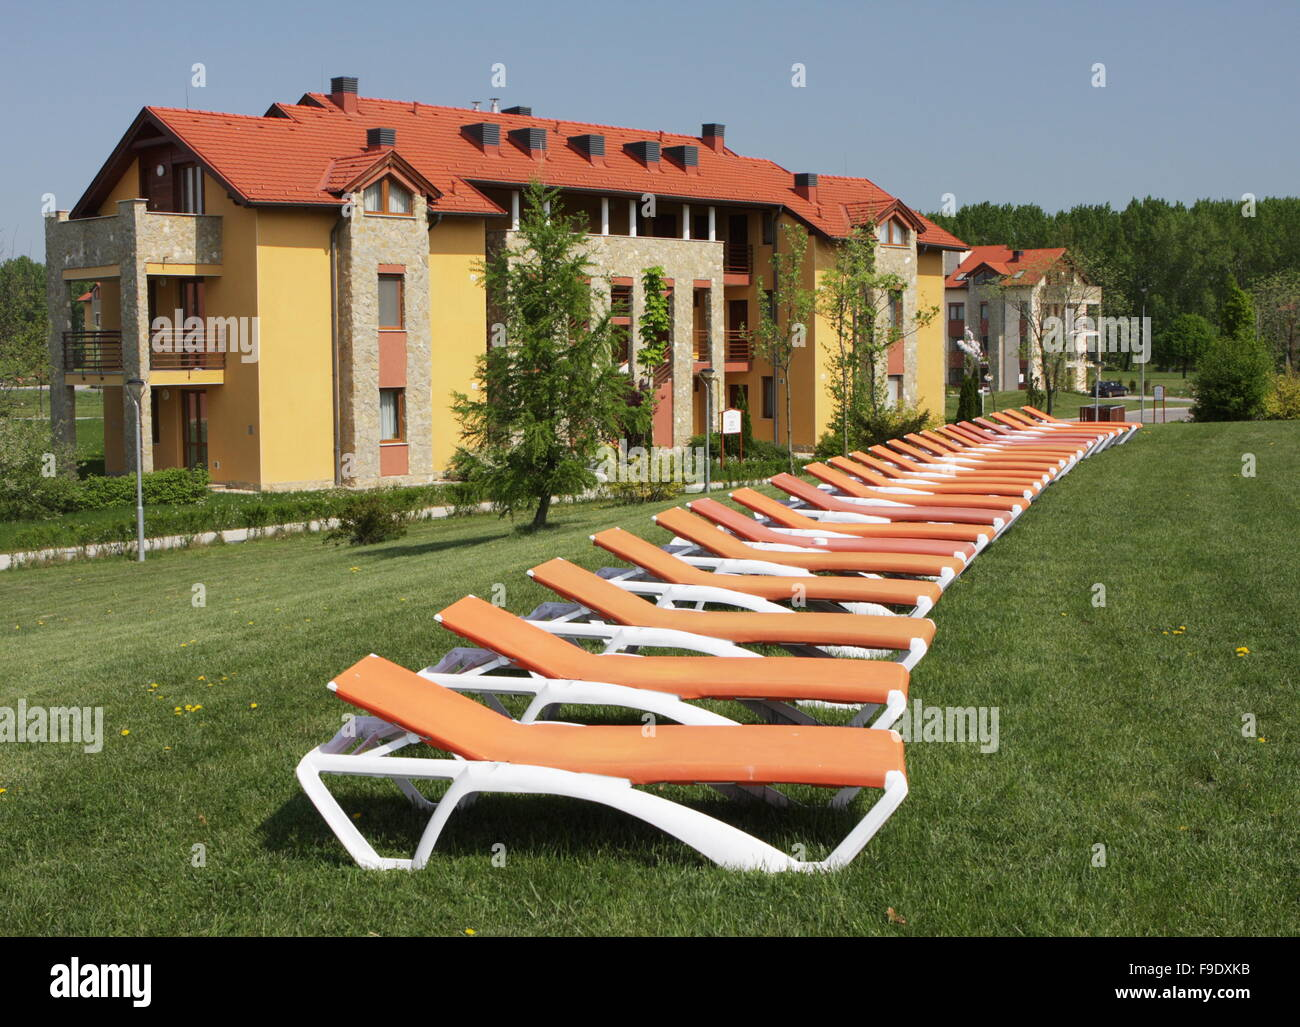 Health and Spa Centre Bükfürdő, Hungary - Stock Image